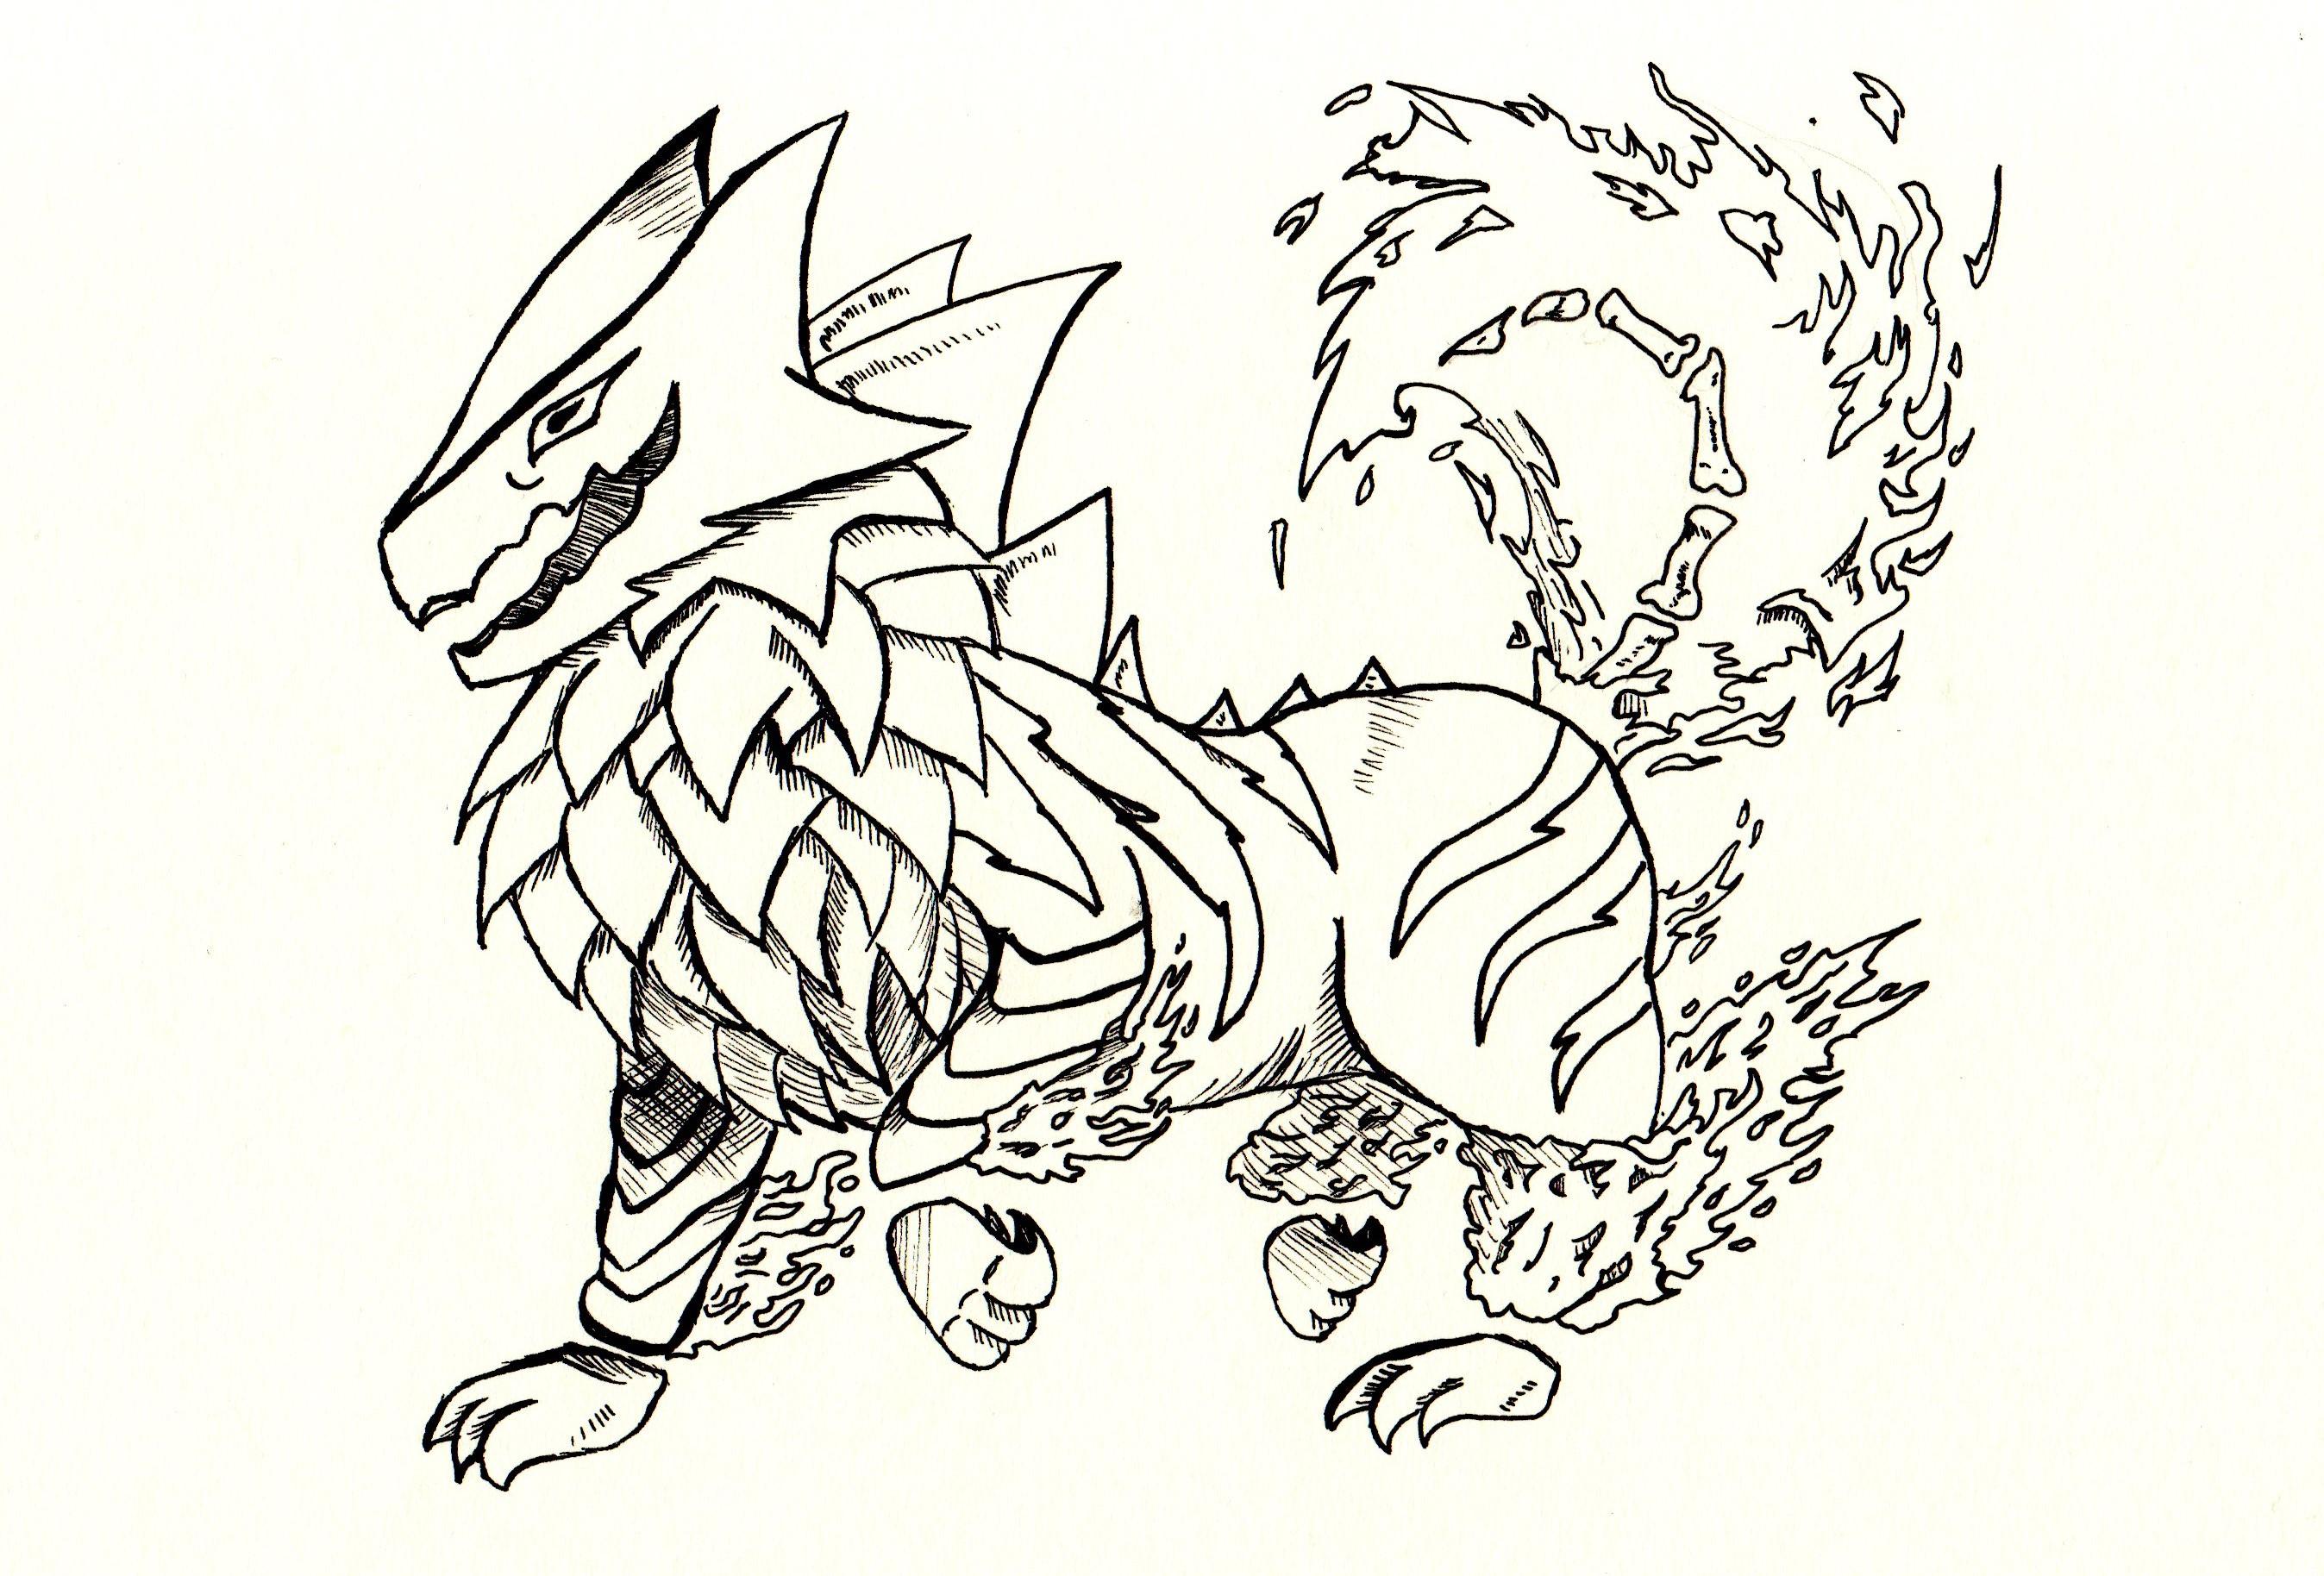 Arcanine + Haunter = Arcater (Sketch)